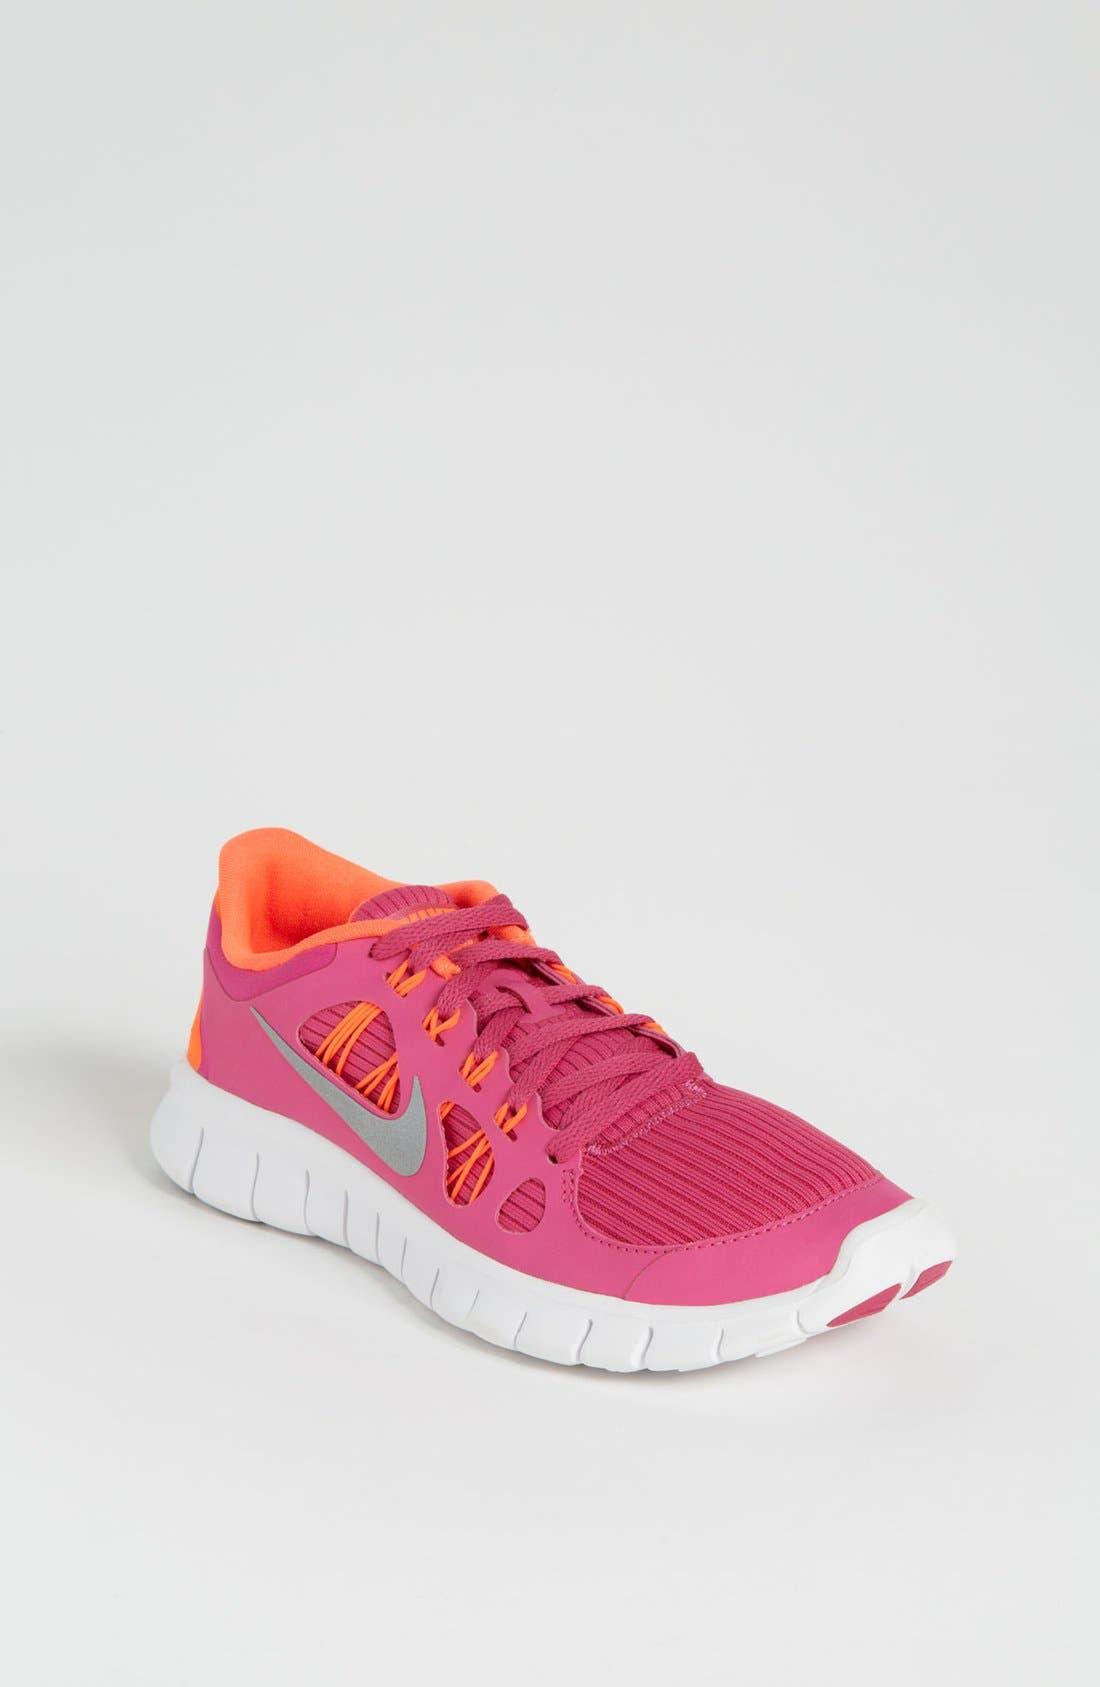 Alternate Image 1 Selected - Nike 'Free Run 5.0' Sneaker (Big Kid)